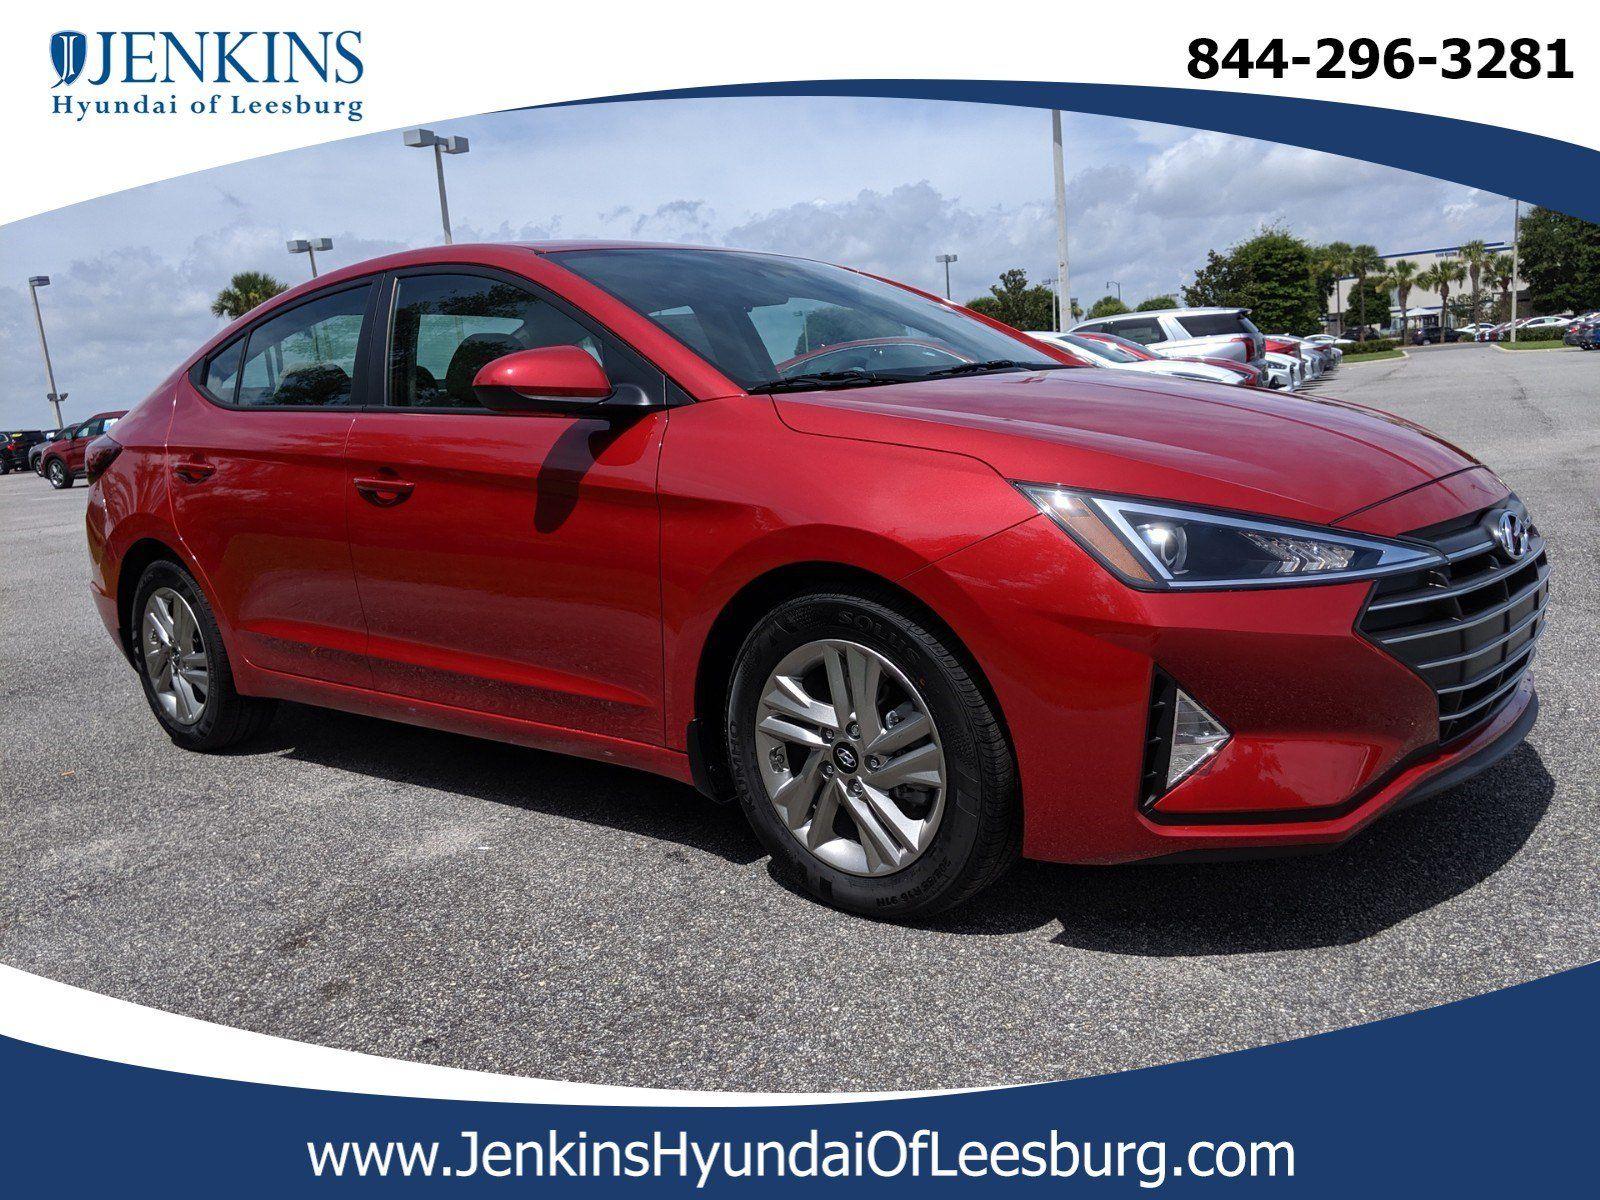 New 2020 Hyundai Elantra For Sale At Jenkins Hyundai Of Leesburg Vin 5npd84lfxlh504080 In 2020 Hyundai Elantra Elantra Hyundai